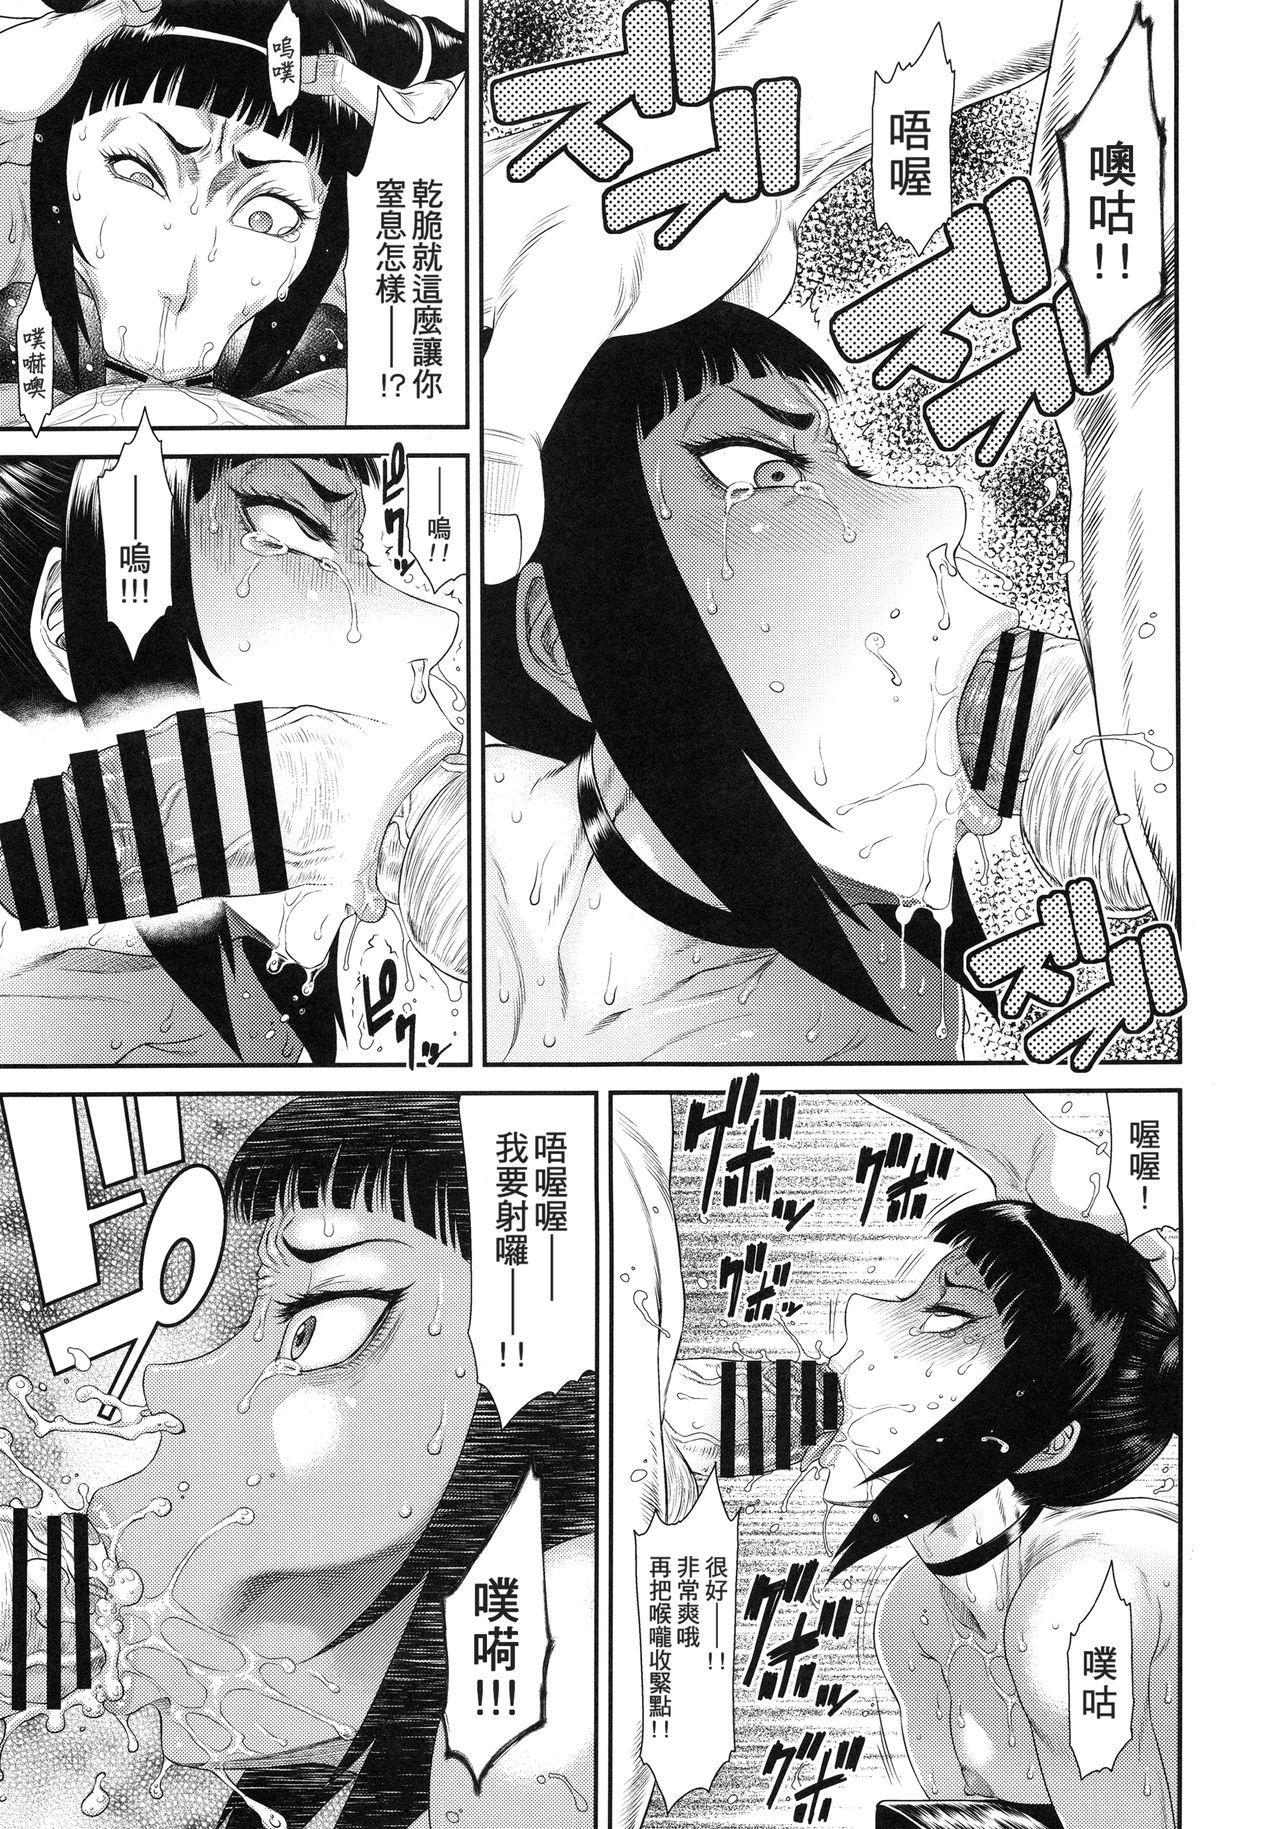 Jaaku - Wicked 6